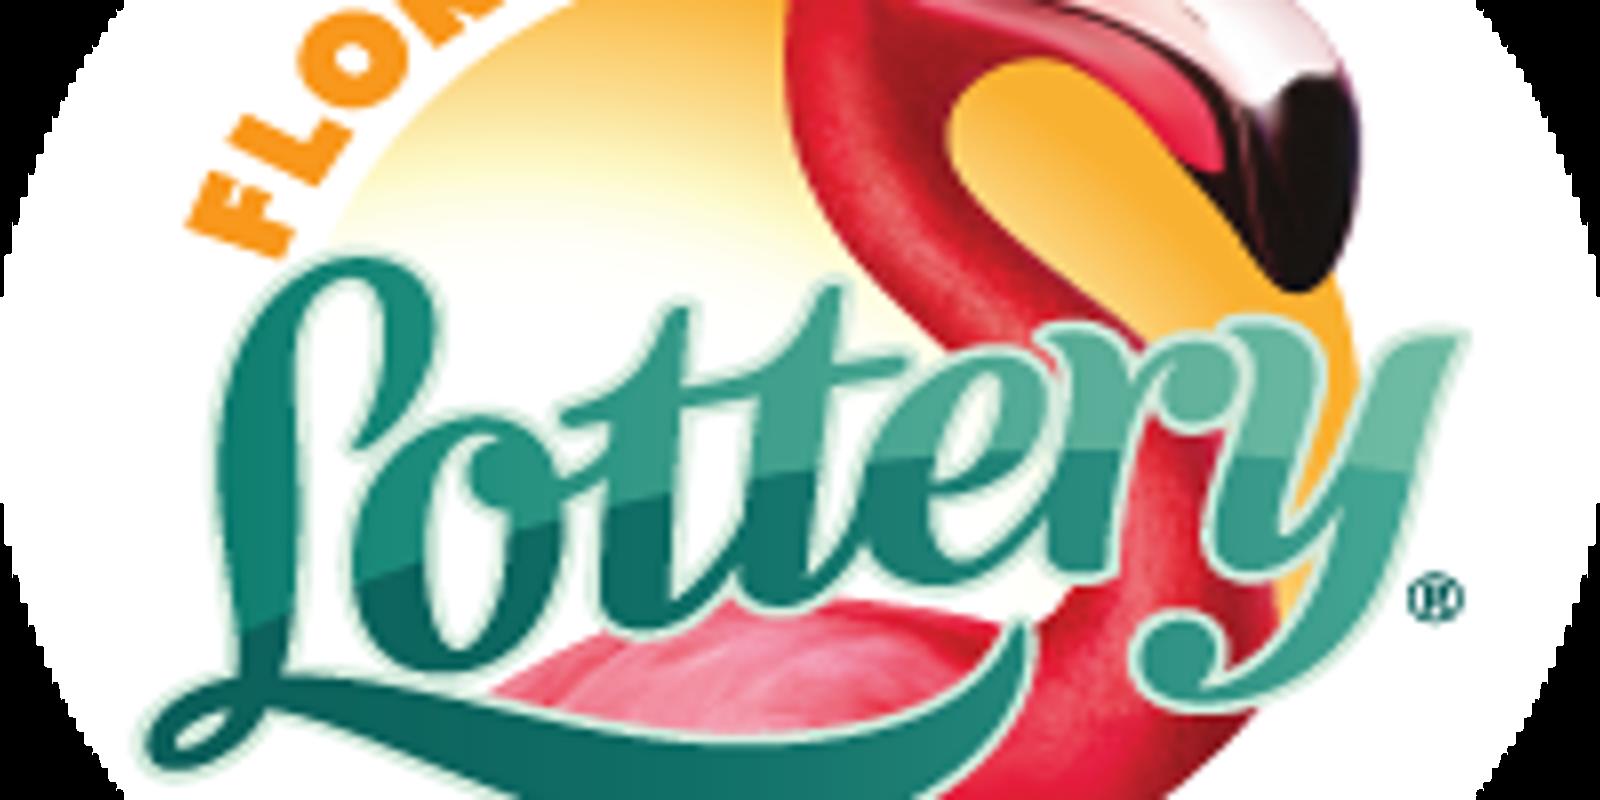 Fllotterywinningnumbers